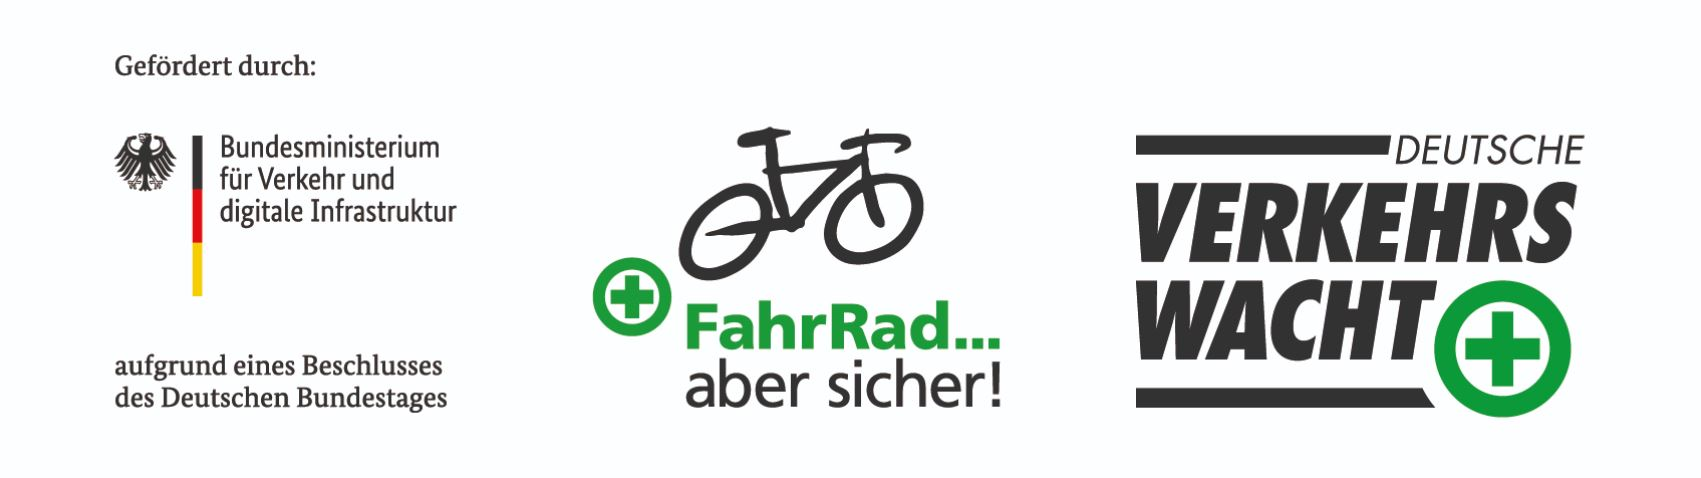 Logo FahrRad